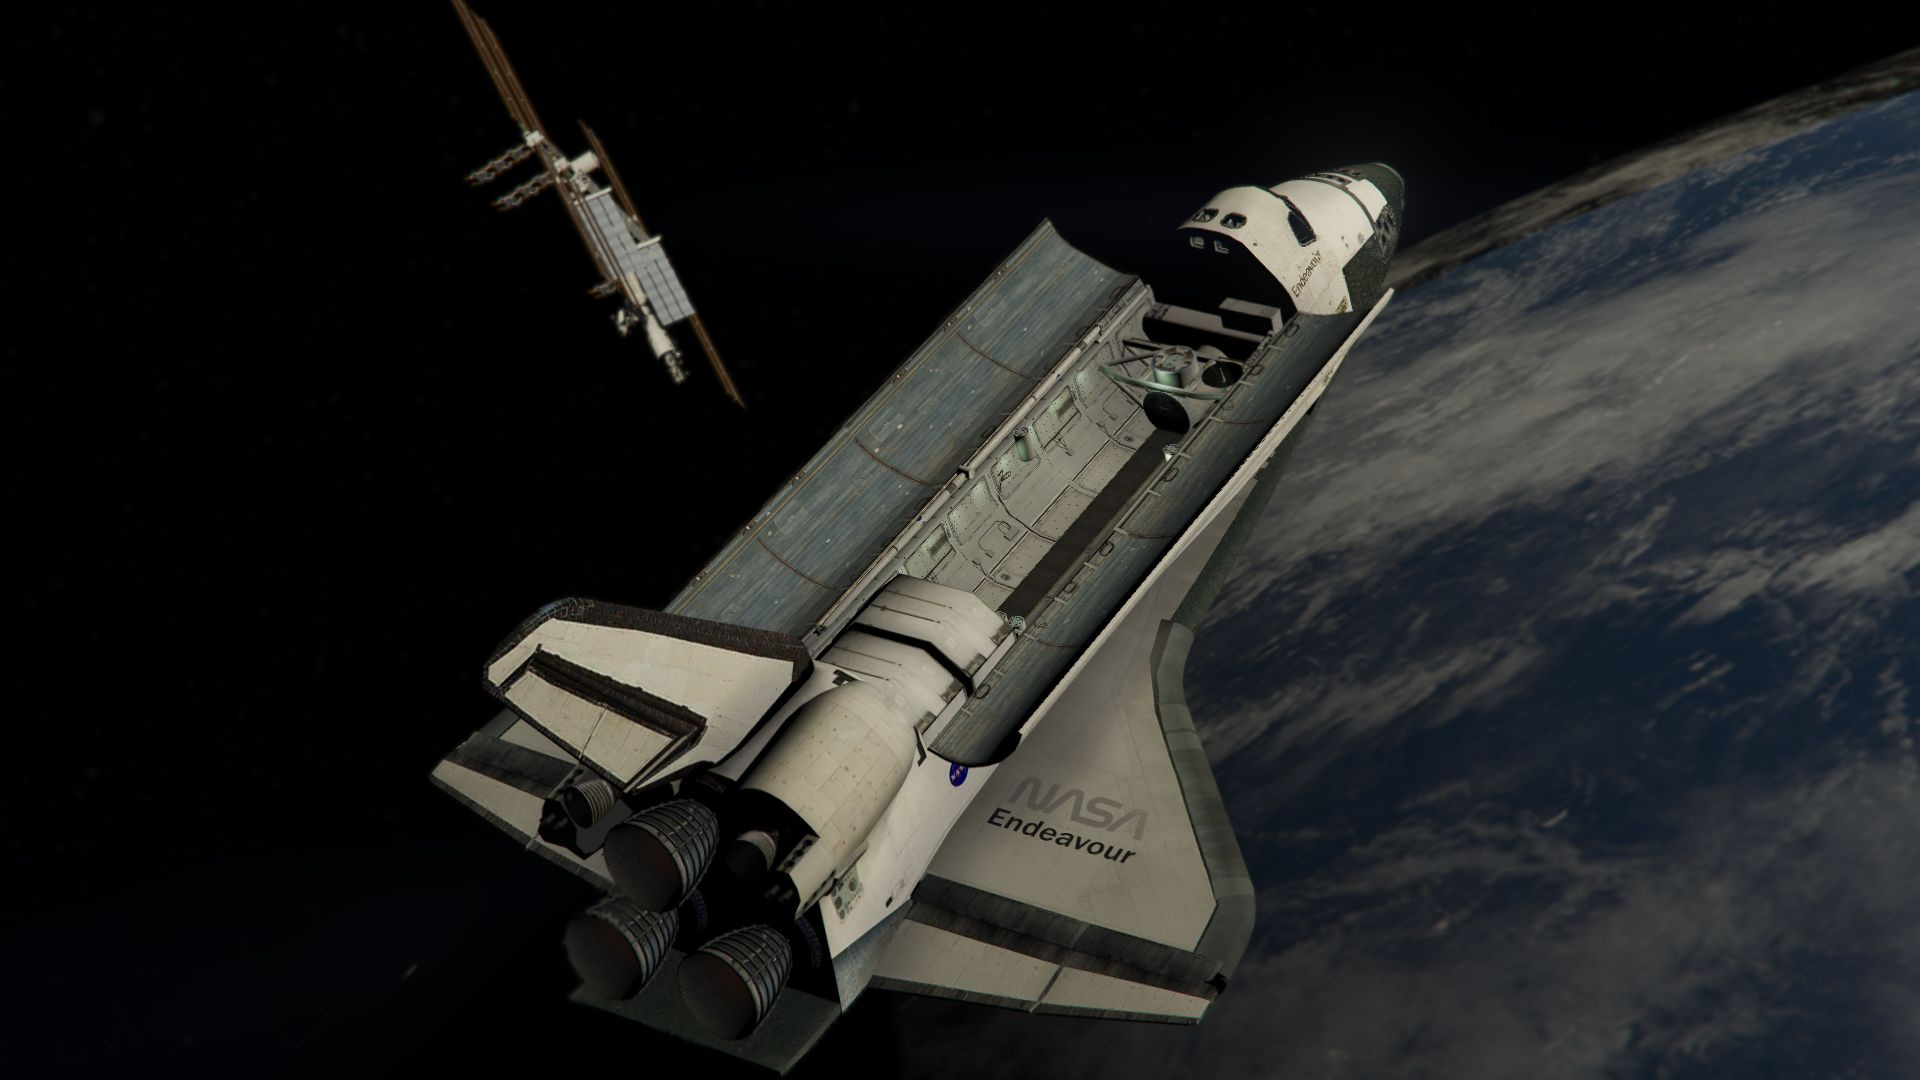 space shuttle program nasa - photo #43